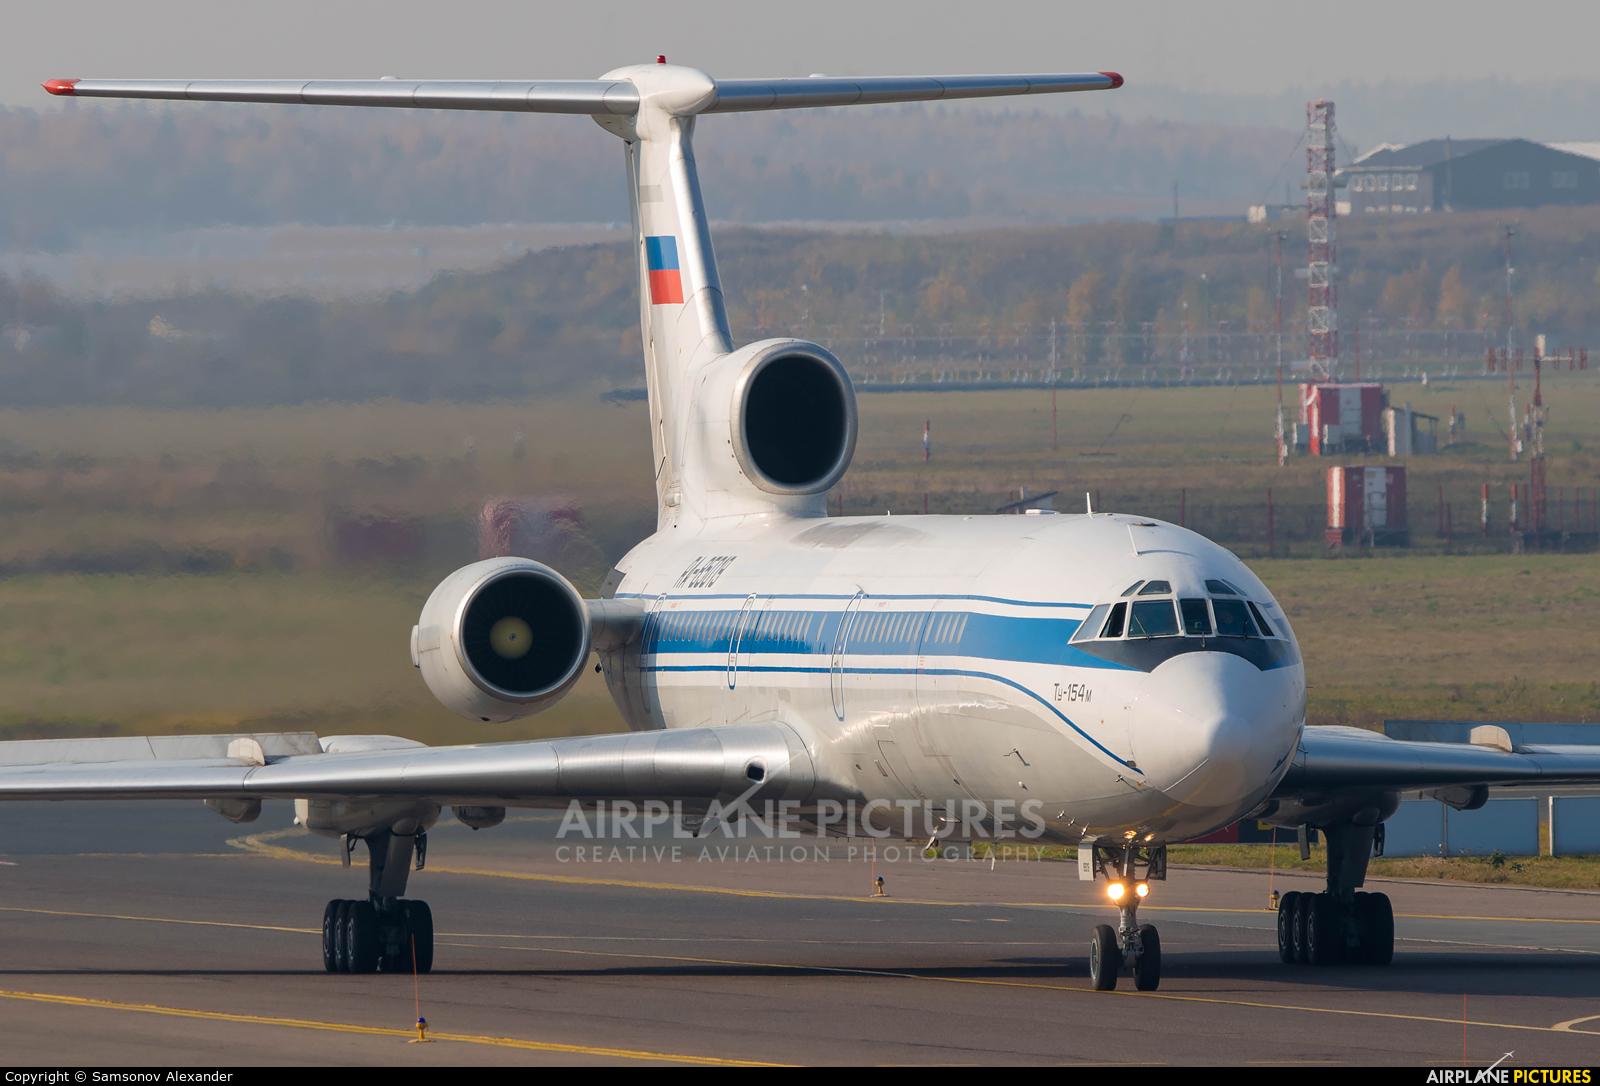 Russia - Federal Border Guard Service RA-85019 aircraft at Moscow - Vnukovo